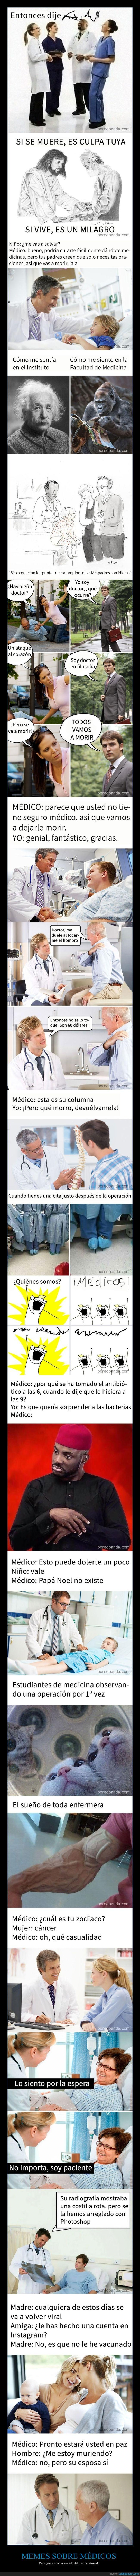 humor negro,médicos,memes